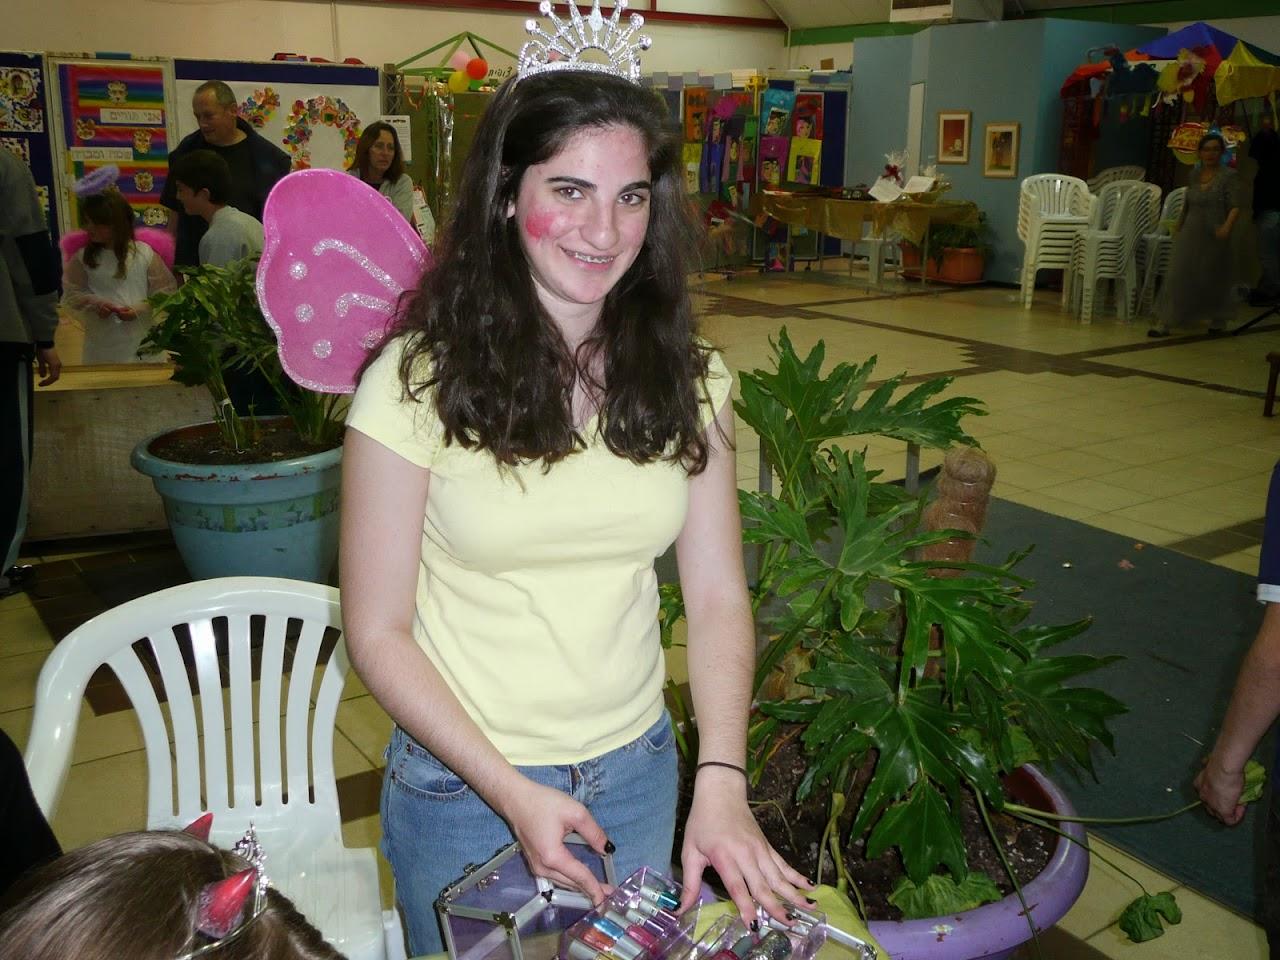 Purim 2008  - 2008-03-20 21.08.32.jpg